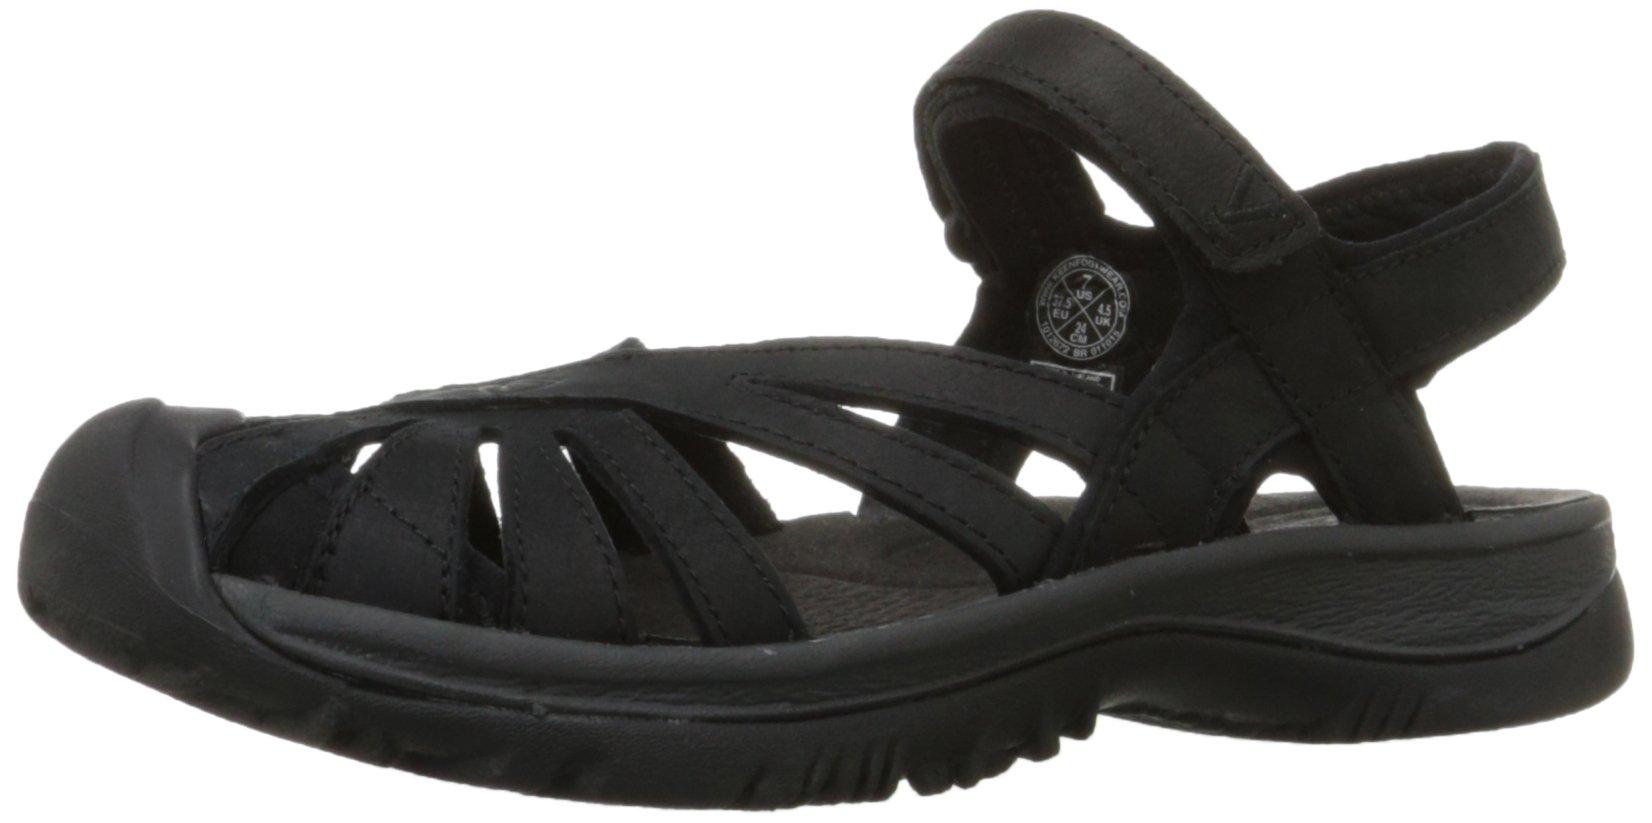 KEEN Women's Rose Leather Sandal, Black/Raven, 6 M US